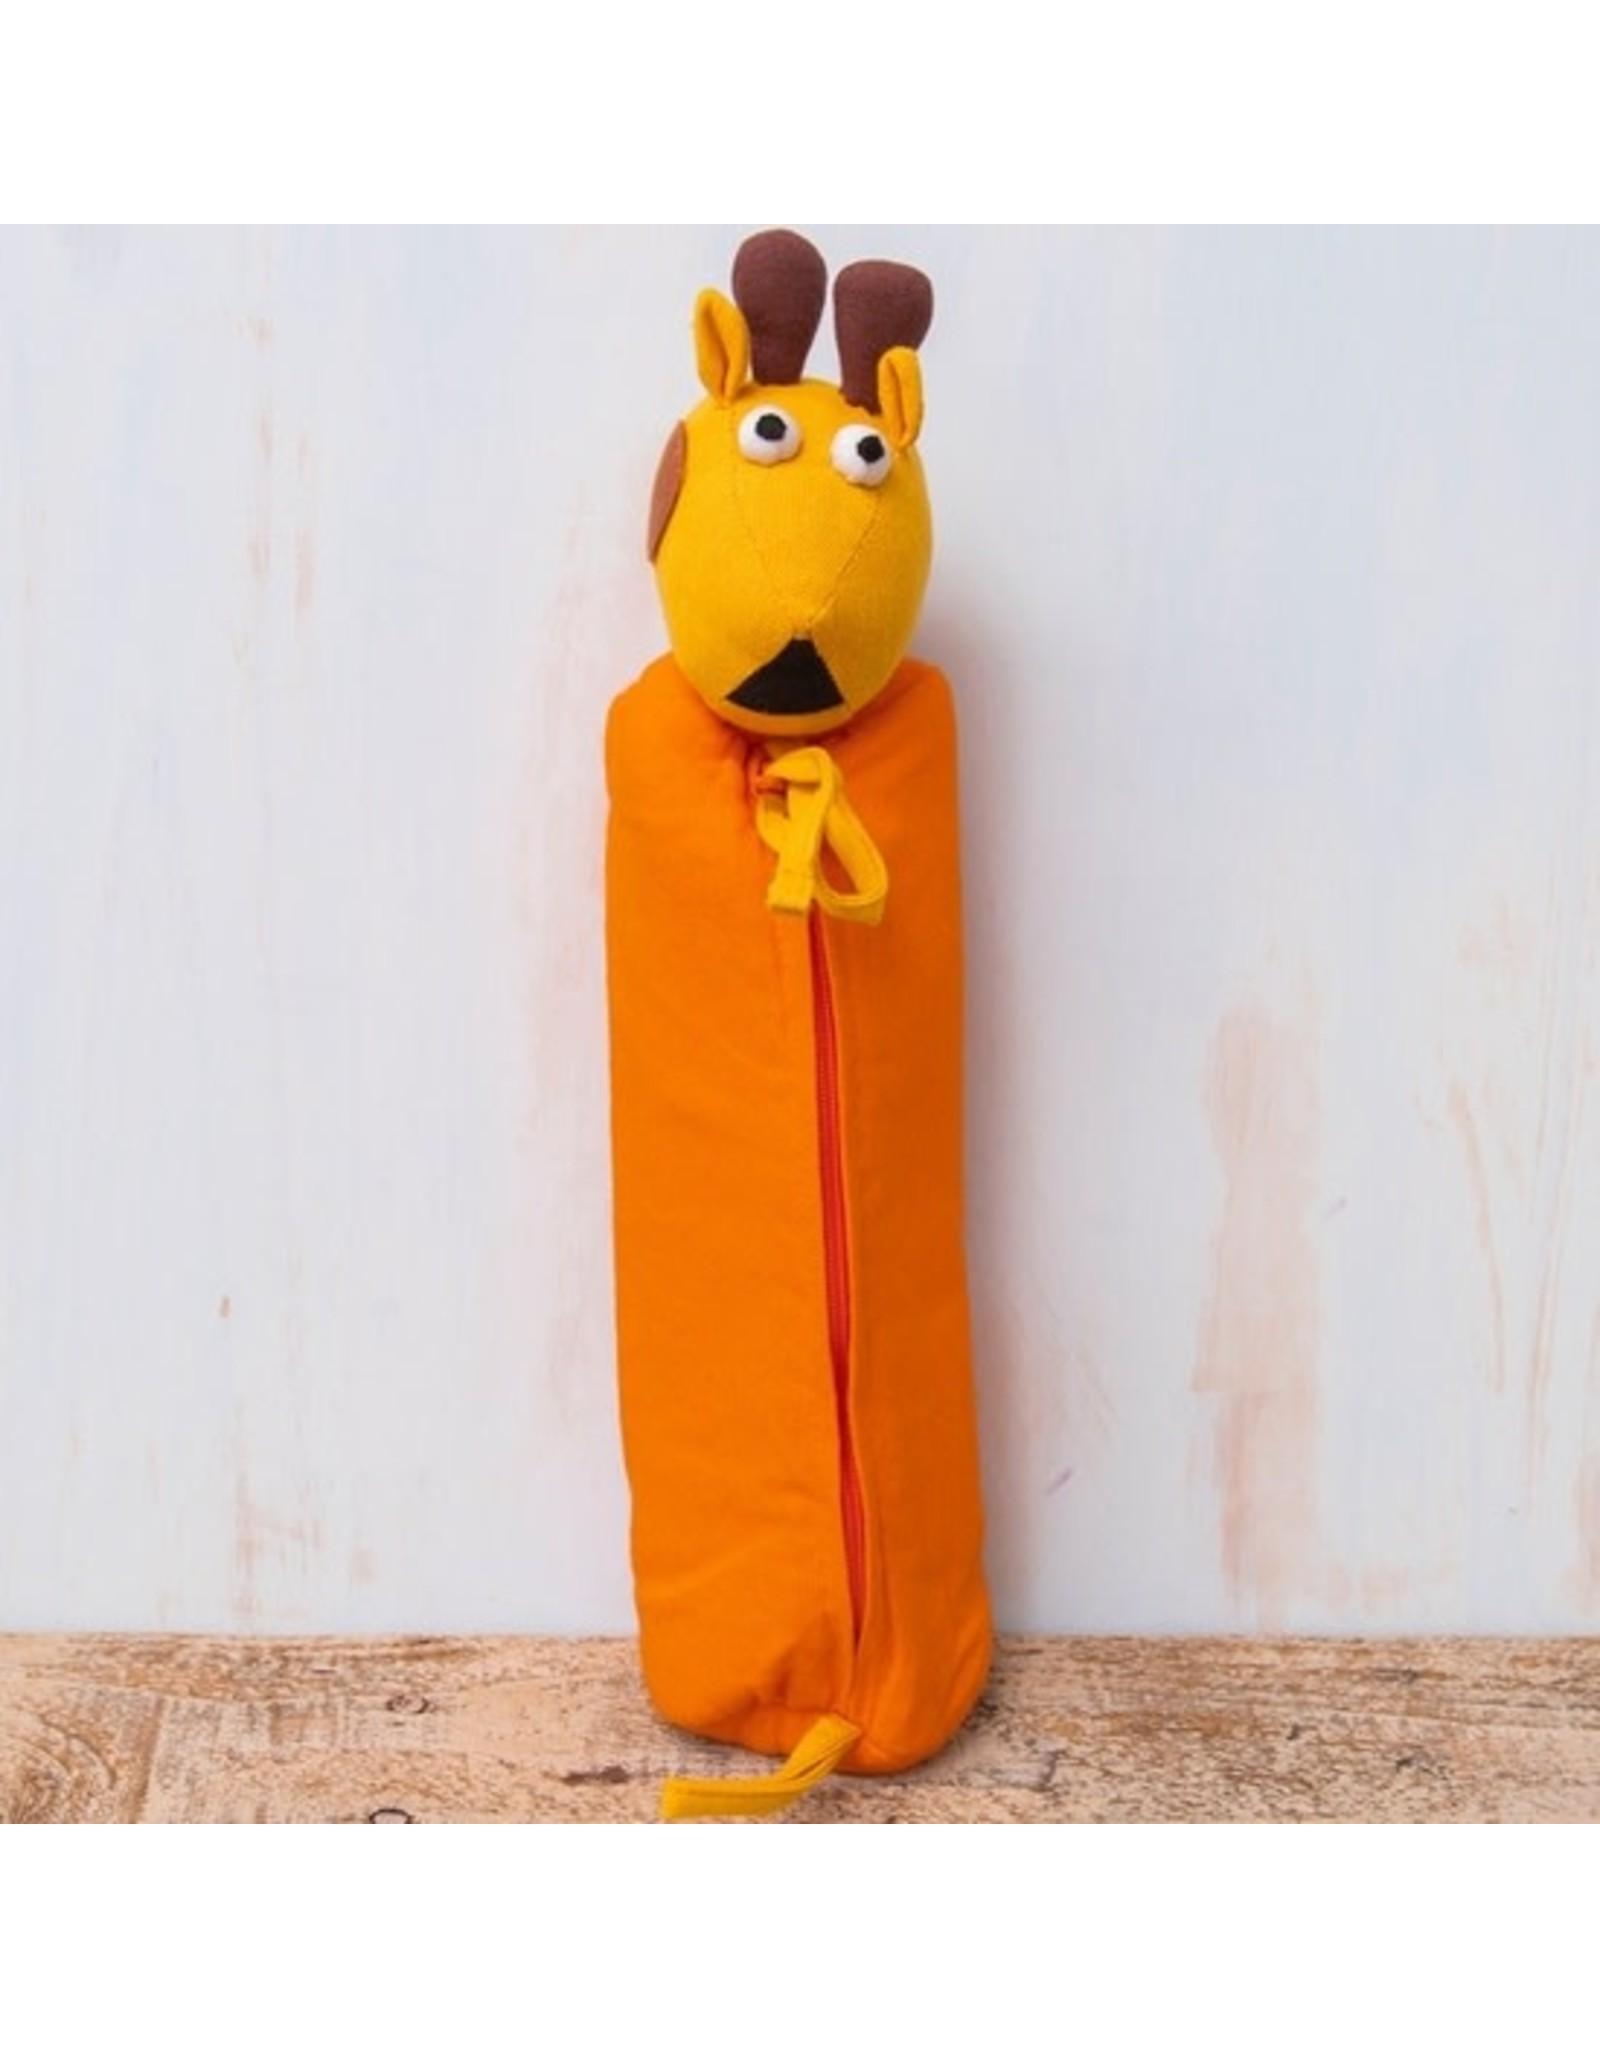 Mr. Ellie Pooh Pencil Case Giraffe, Sri Lanka